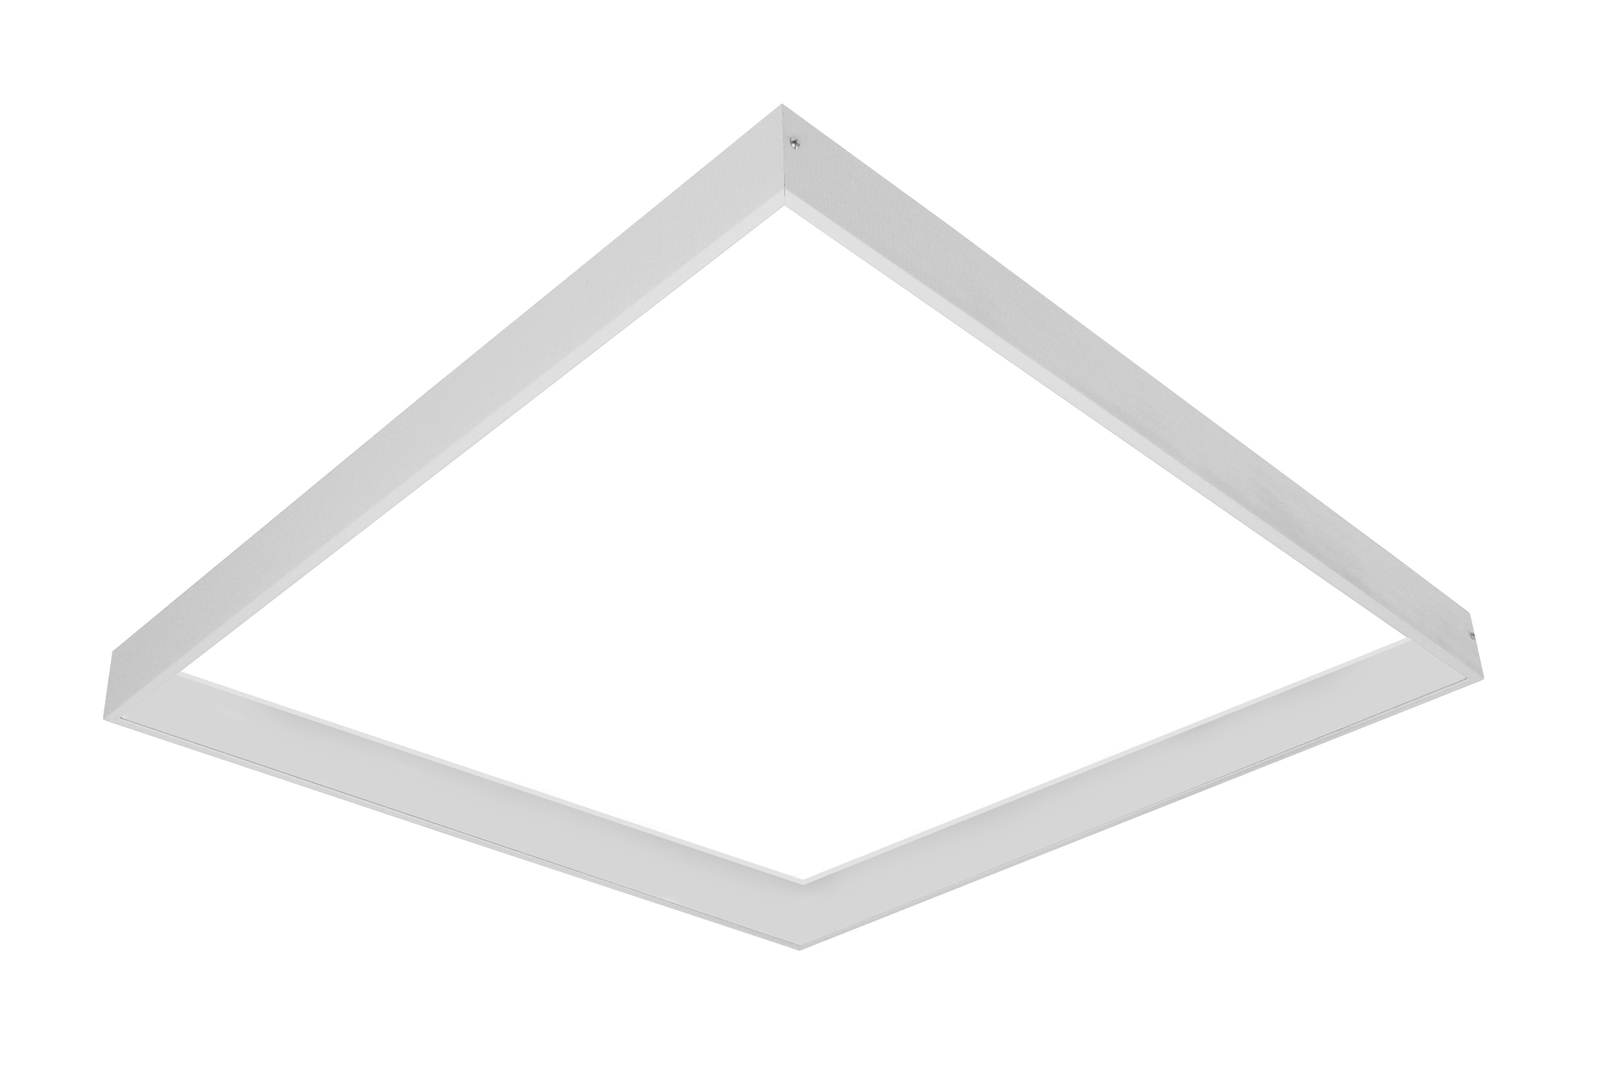 Mounting frame surface for LED 60/60 panels